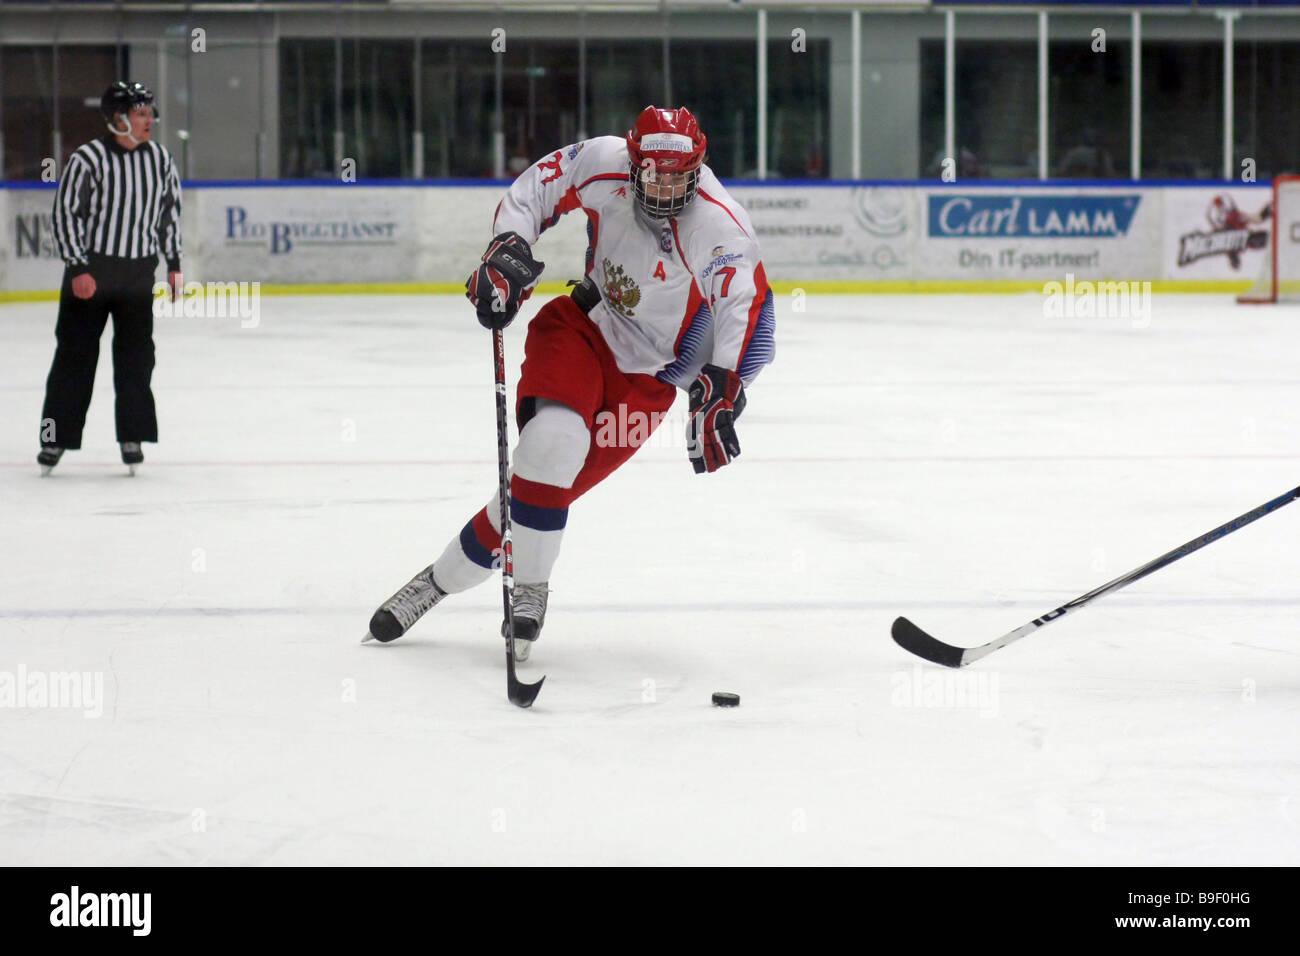 Joueur de hockey sur glace russe n° 27 Stanislav Solovyev Photo Stock